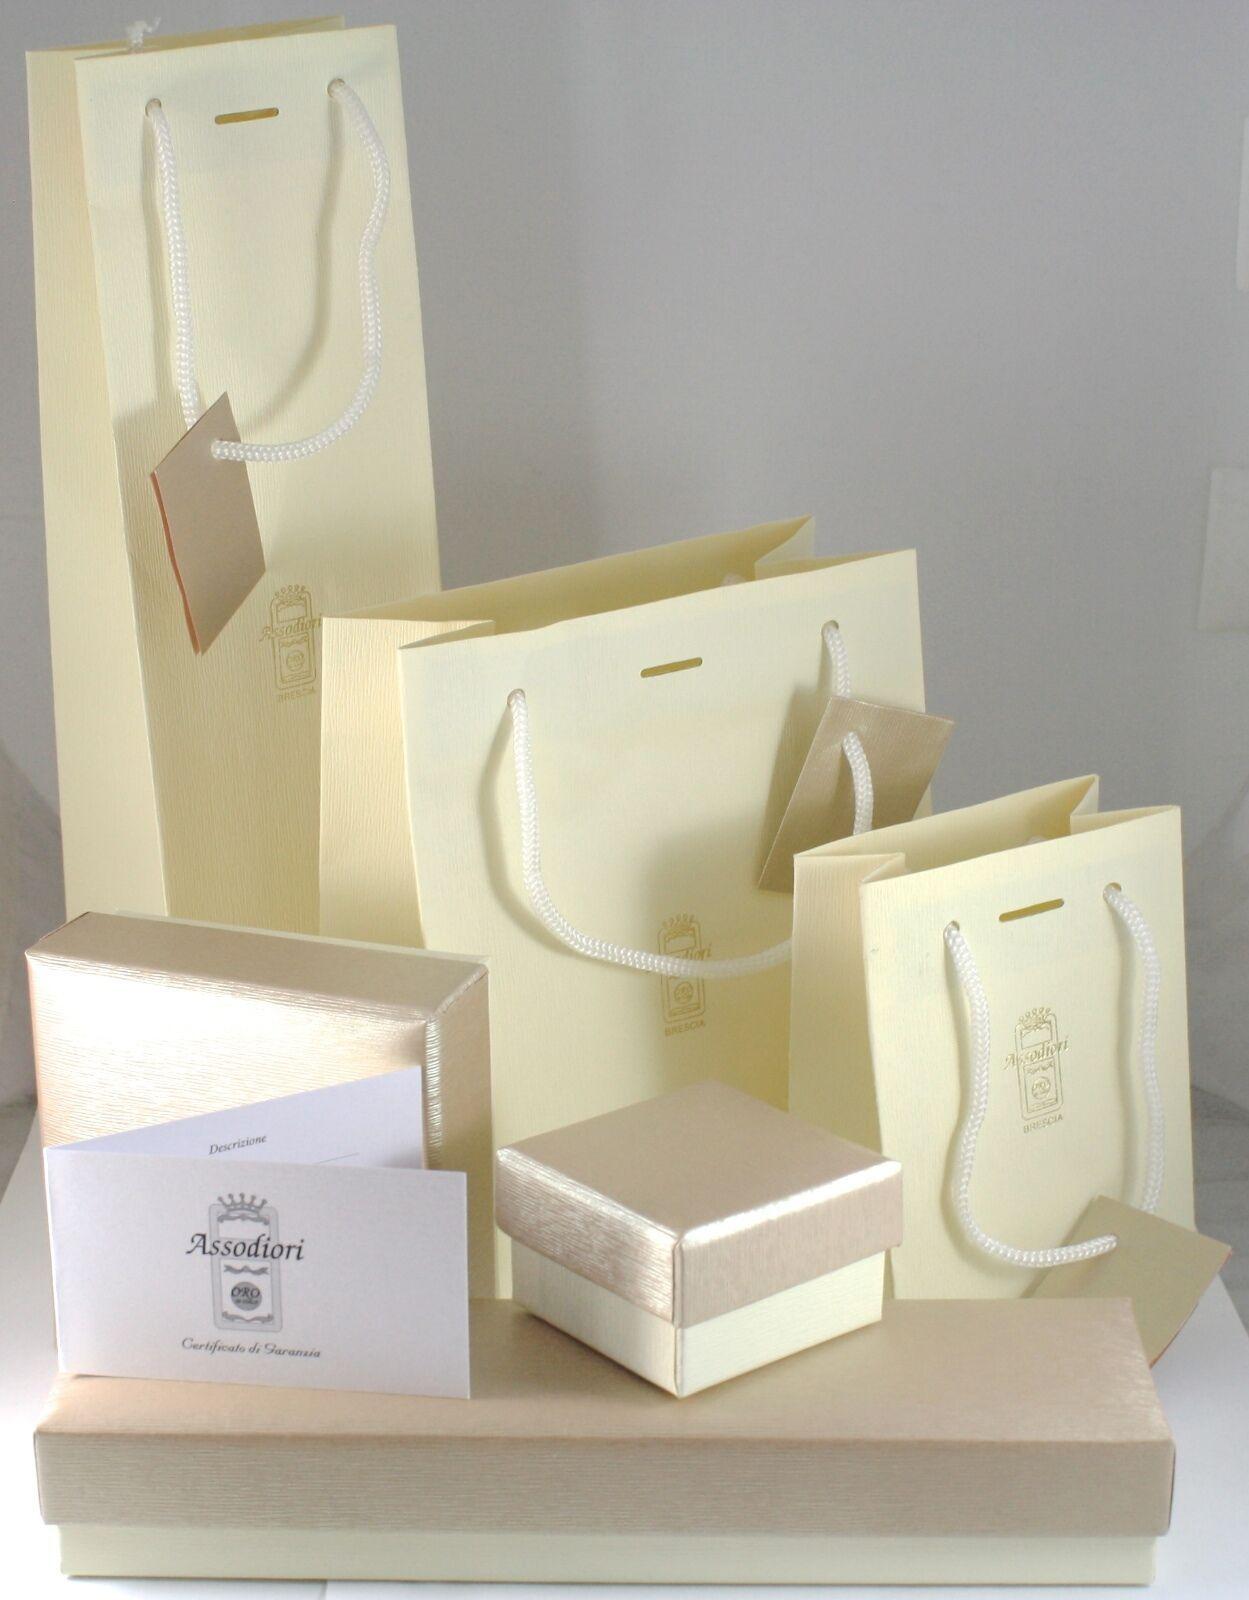 BRACELET WHITE GOLD 750 18K, WHITE PEARLS 9 MM, TOURMALINE RED, CHAIN VENETIAN